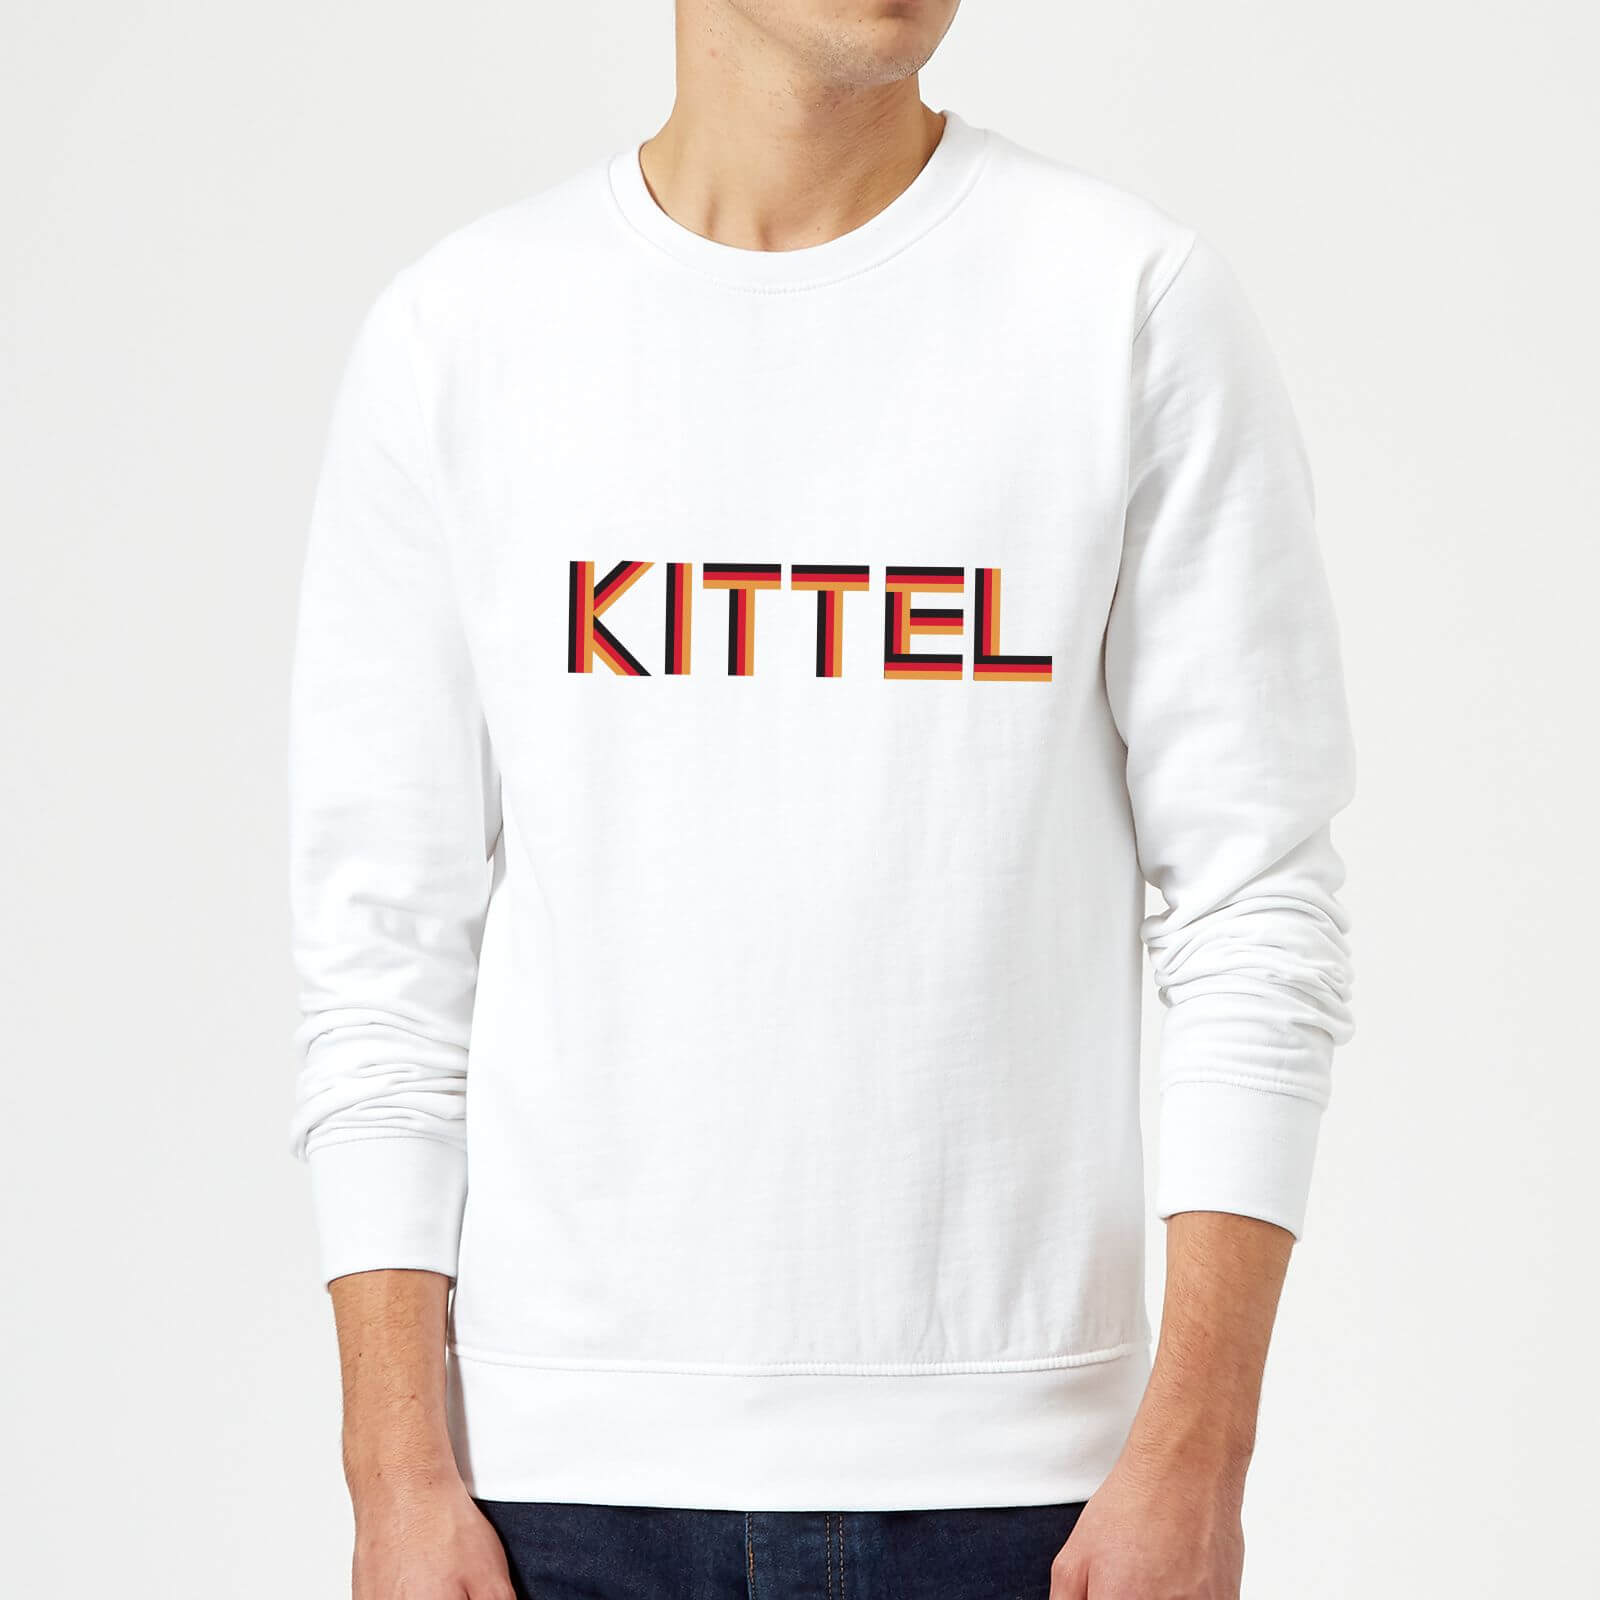 Summit Finish Kittel - Rider Name Sweatshirt - White - XL - White